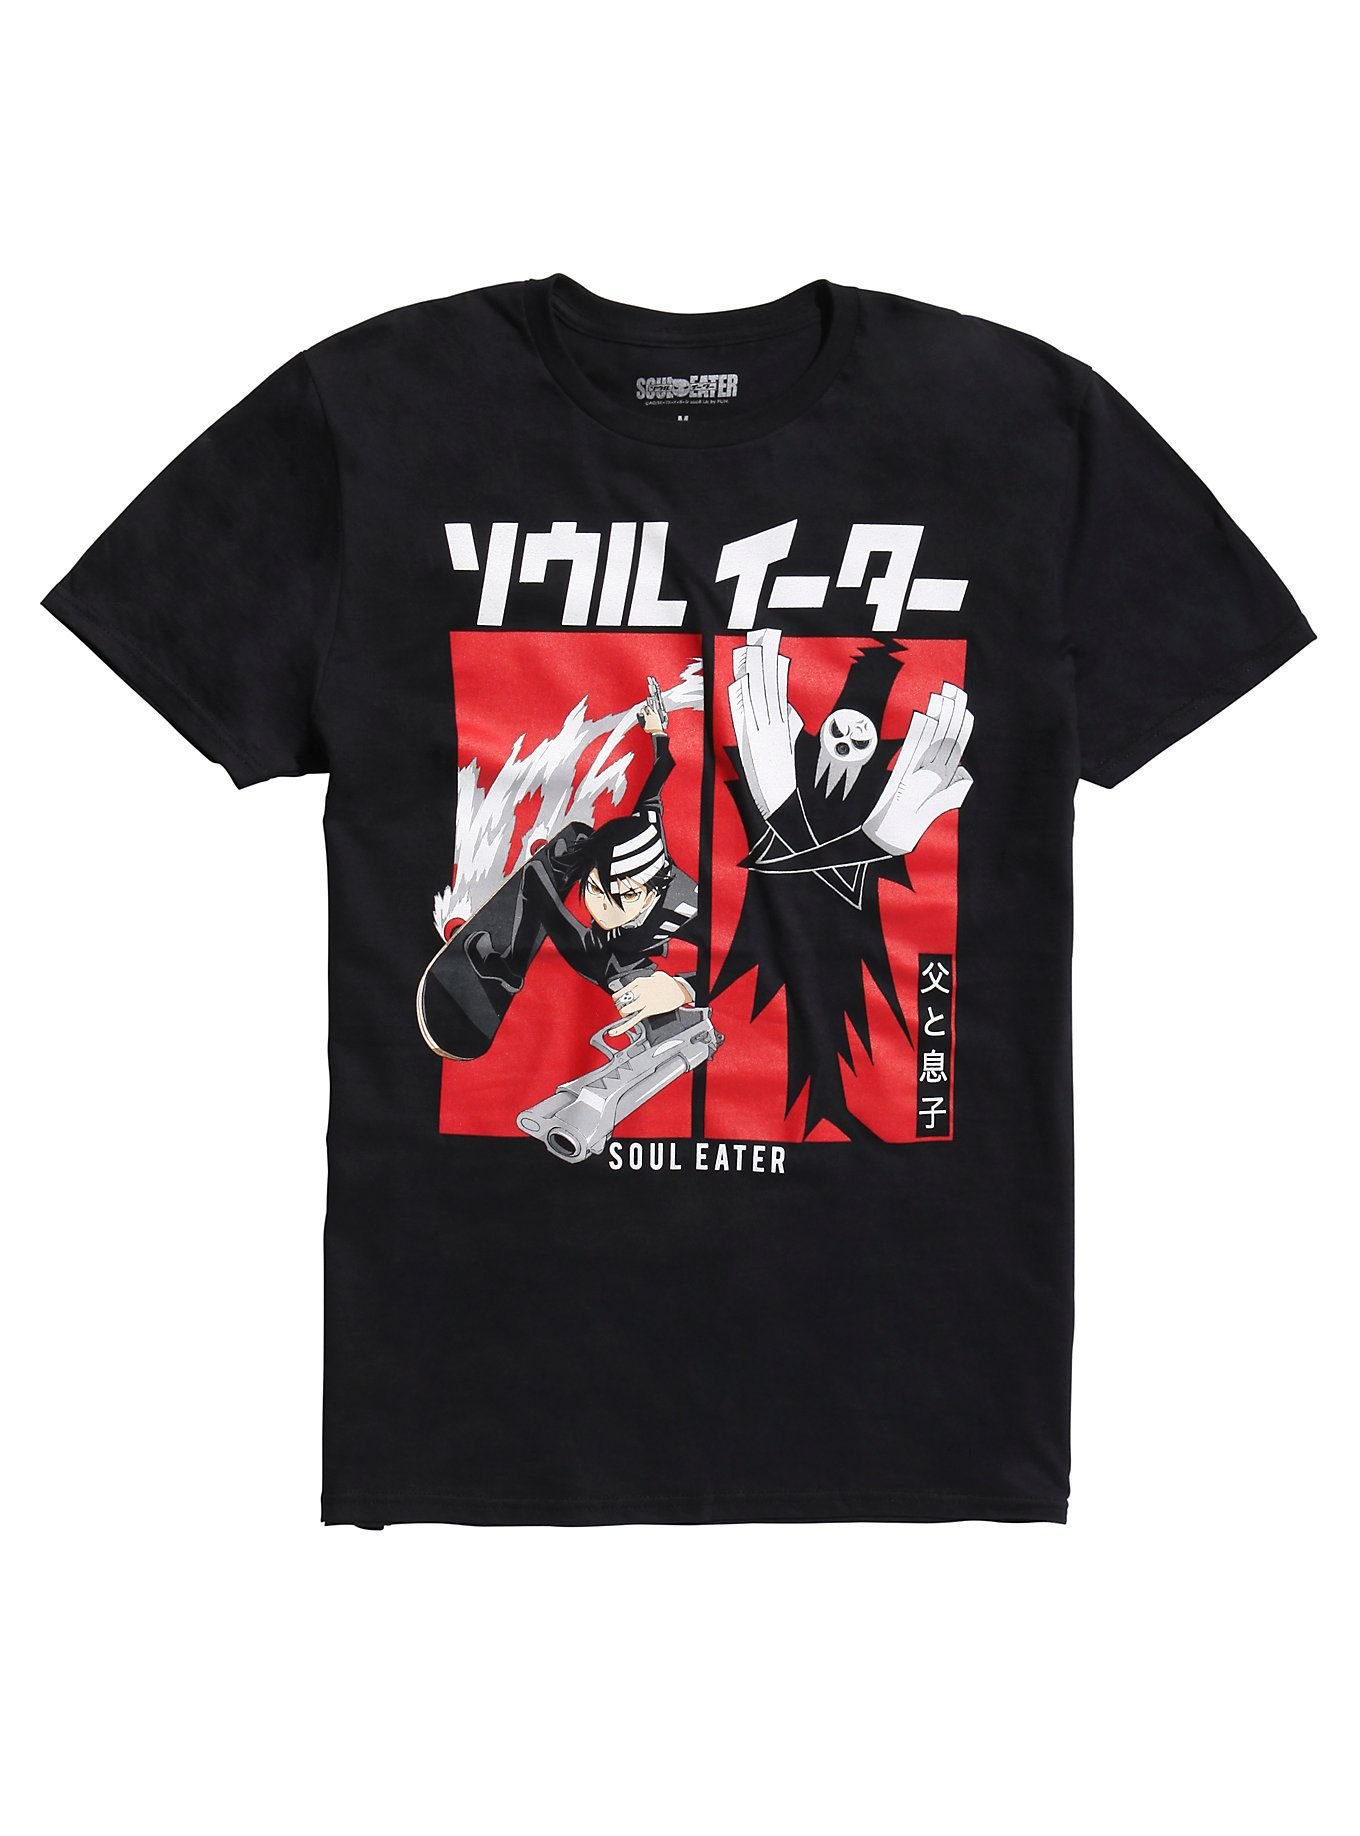 0b7440fbe71 Soul Eater Not T Shirt - BCD Tofu House